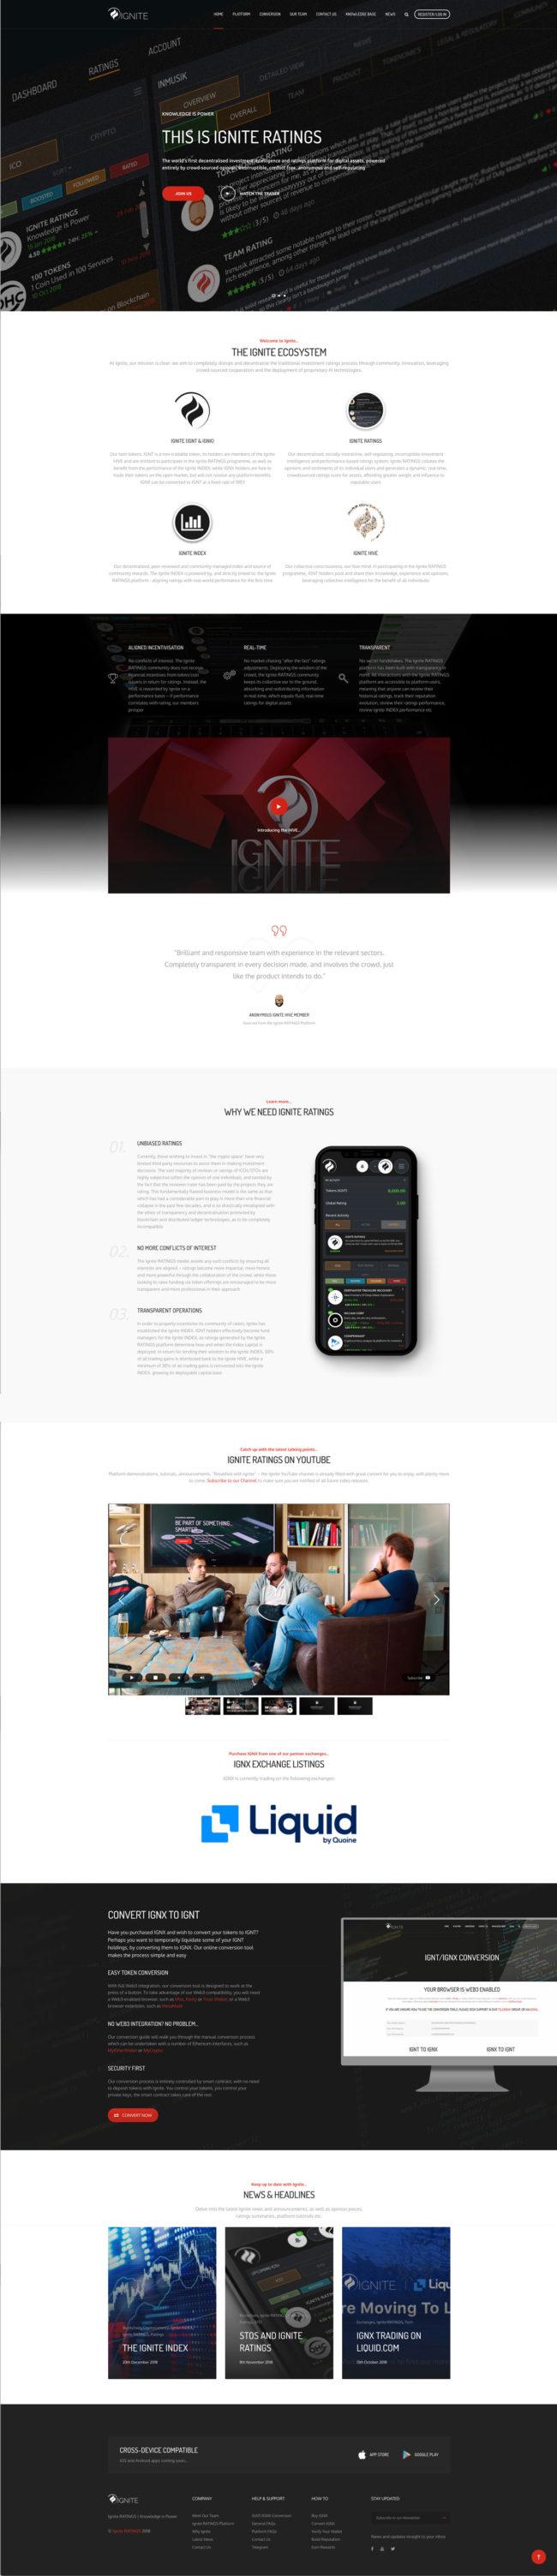 Ignite Ratings website UI design